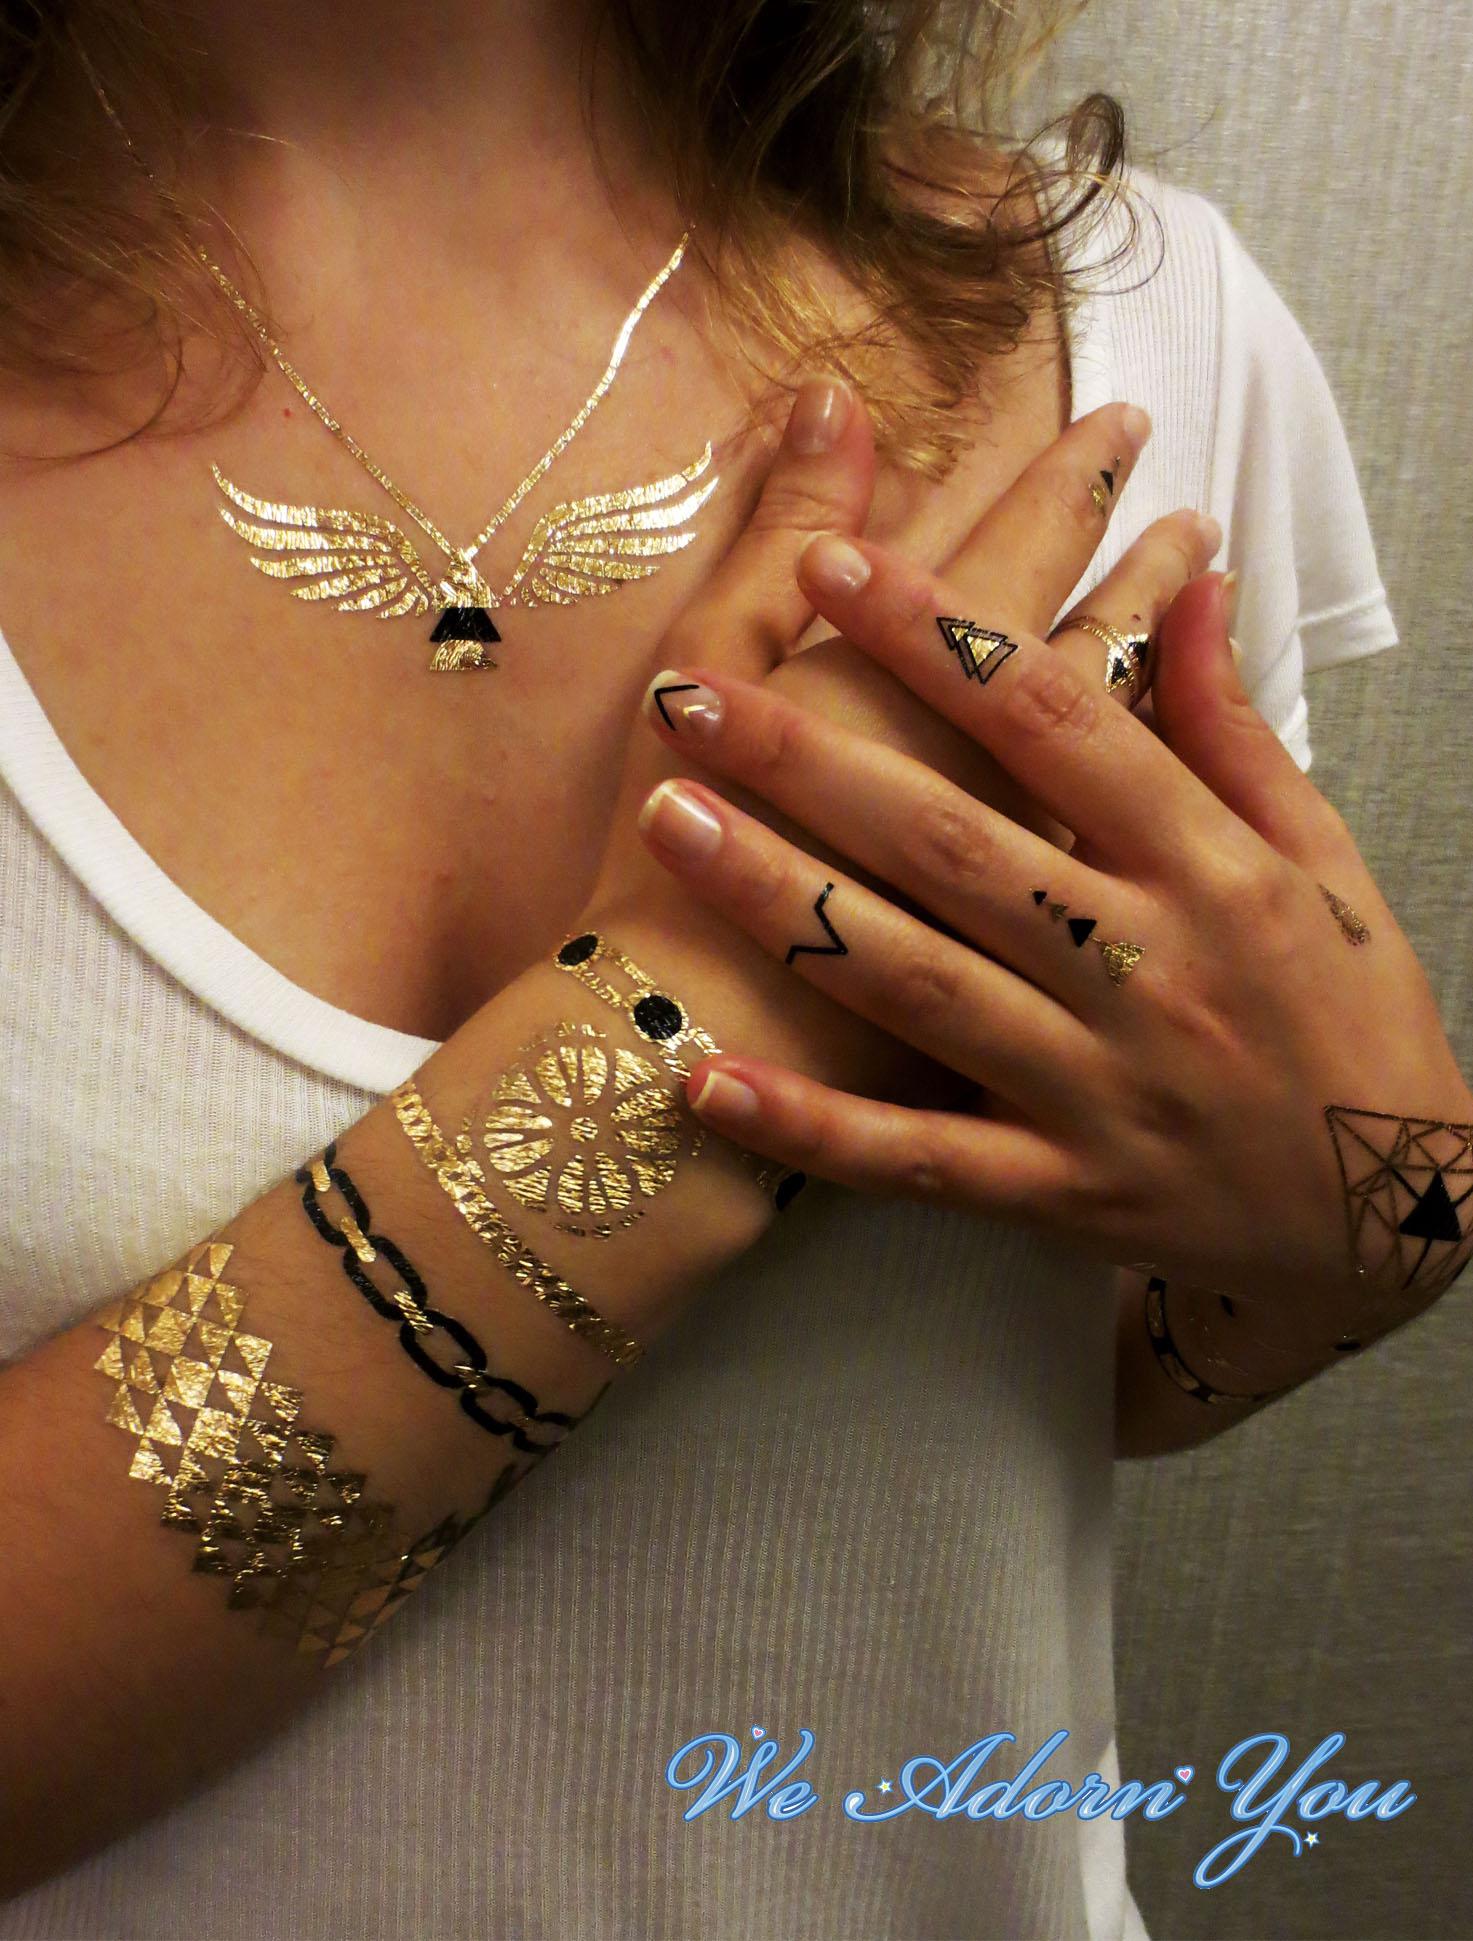 Flash Tattoo Egypt - We Adorn You.jpg